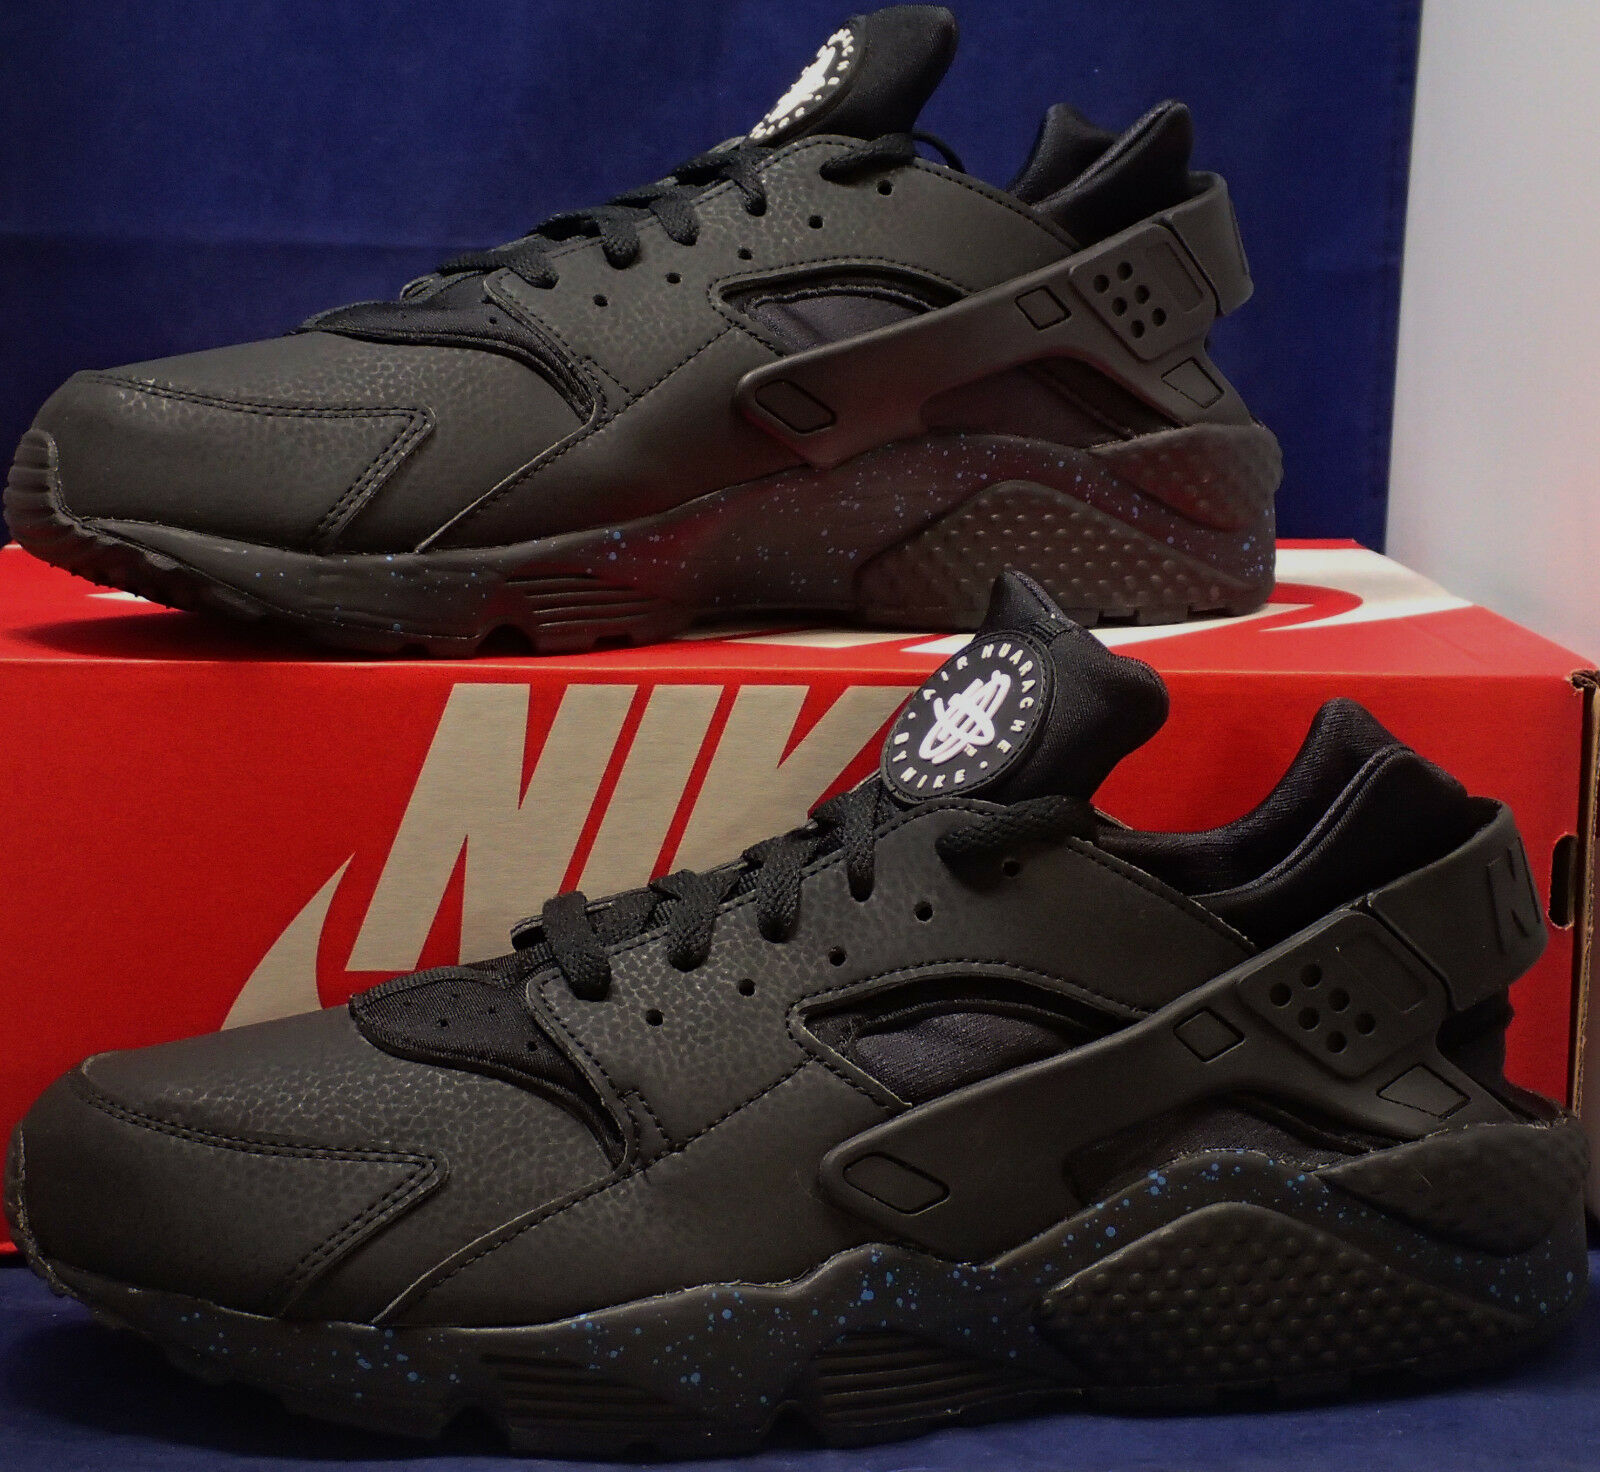 Nike air huarache lauf id schwarz blau sz 12 12 12 (777330-903) fc2b85